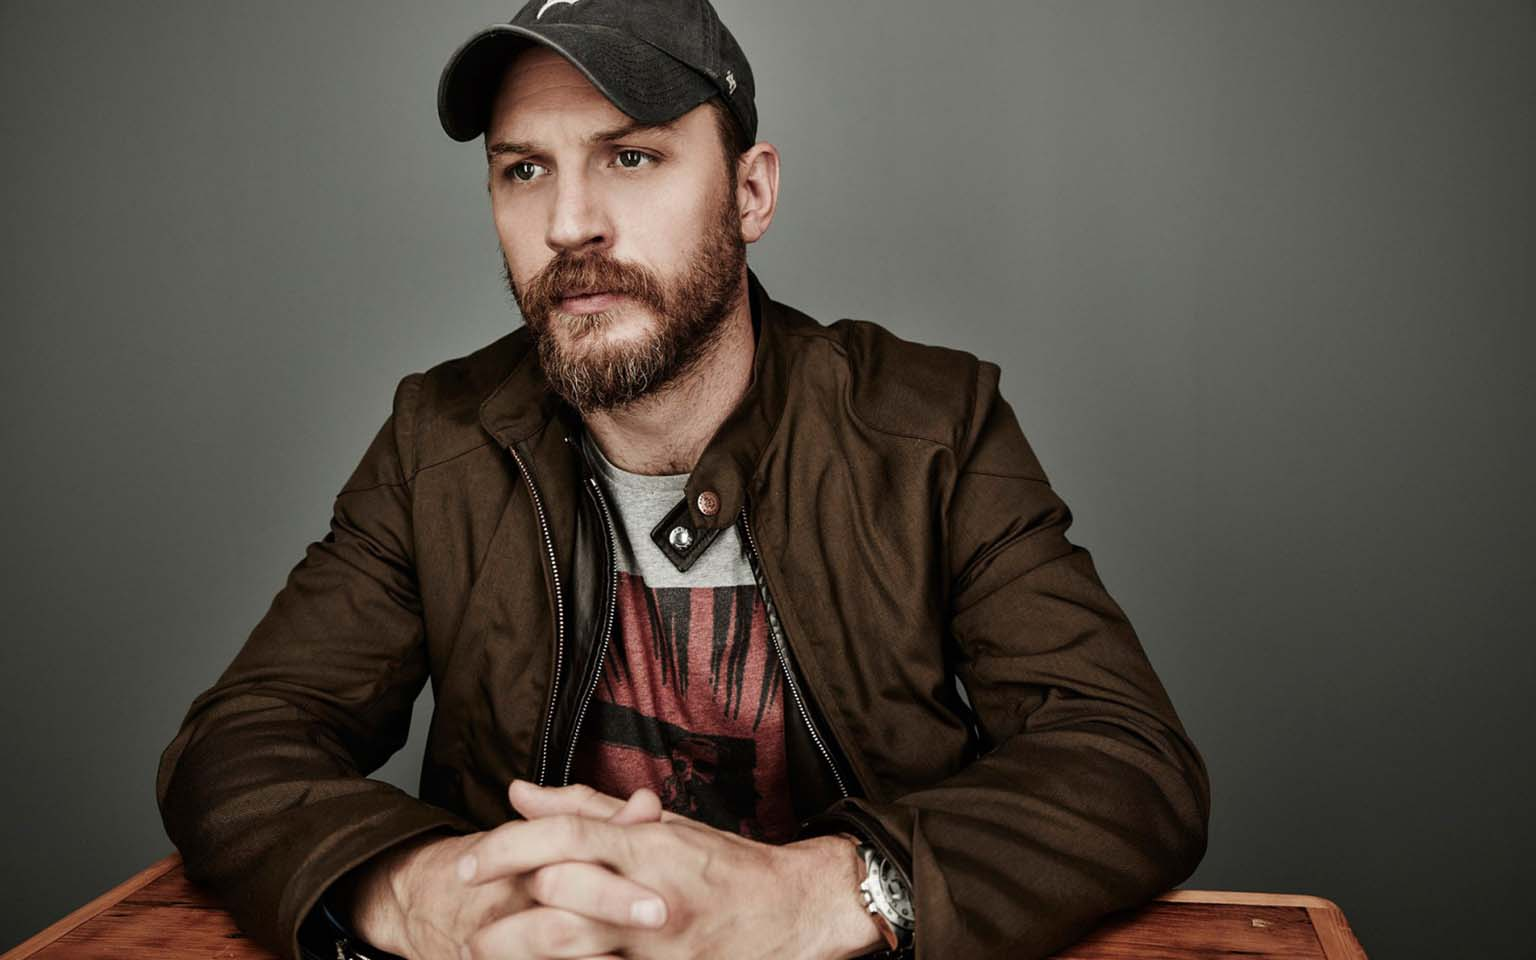 tom_hardy_actor_cap_beard_104634_3840x2400